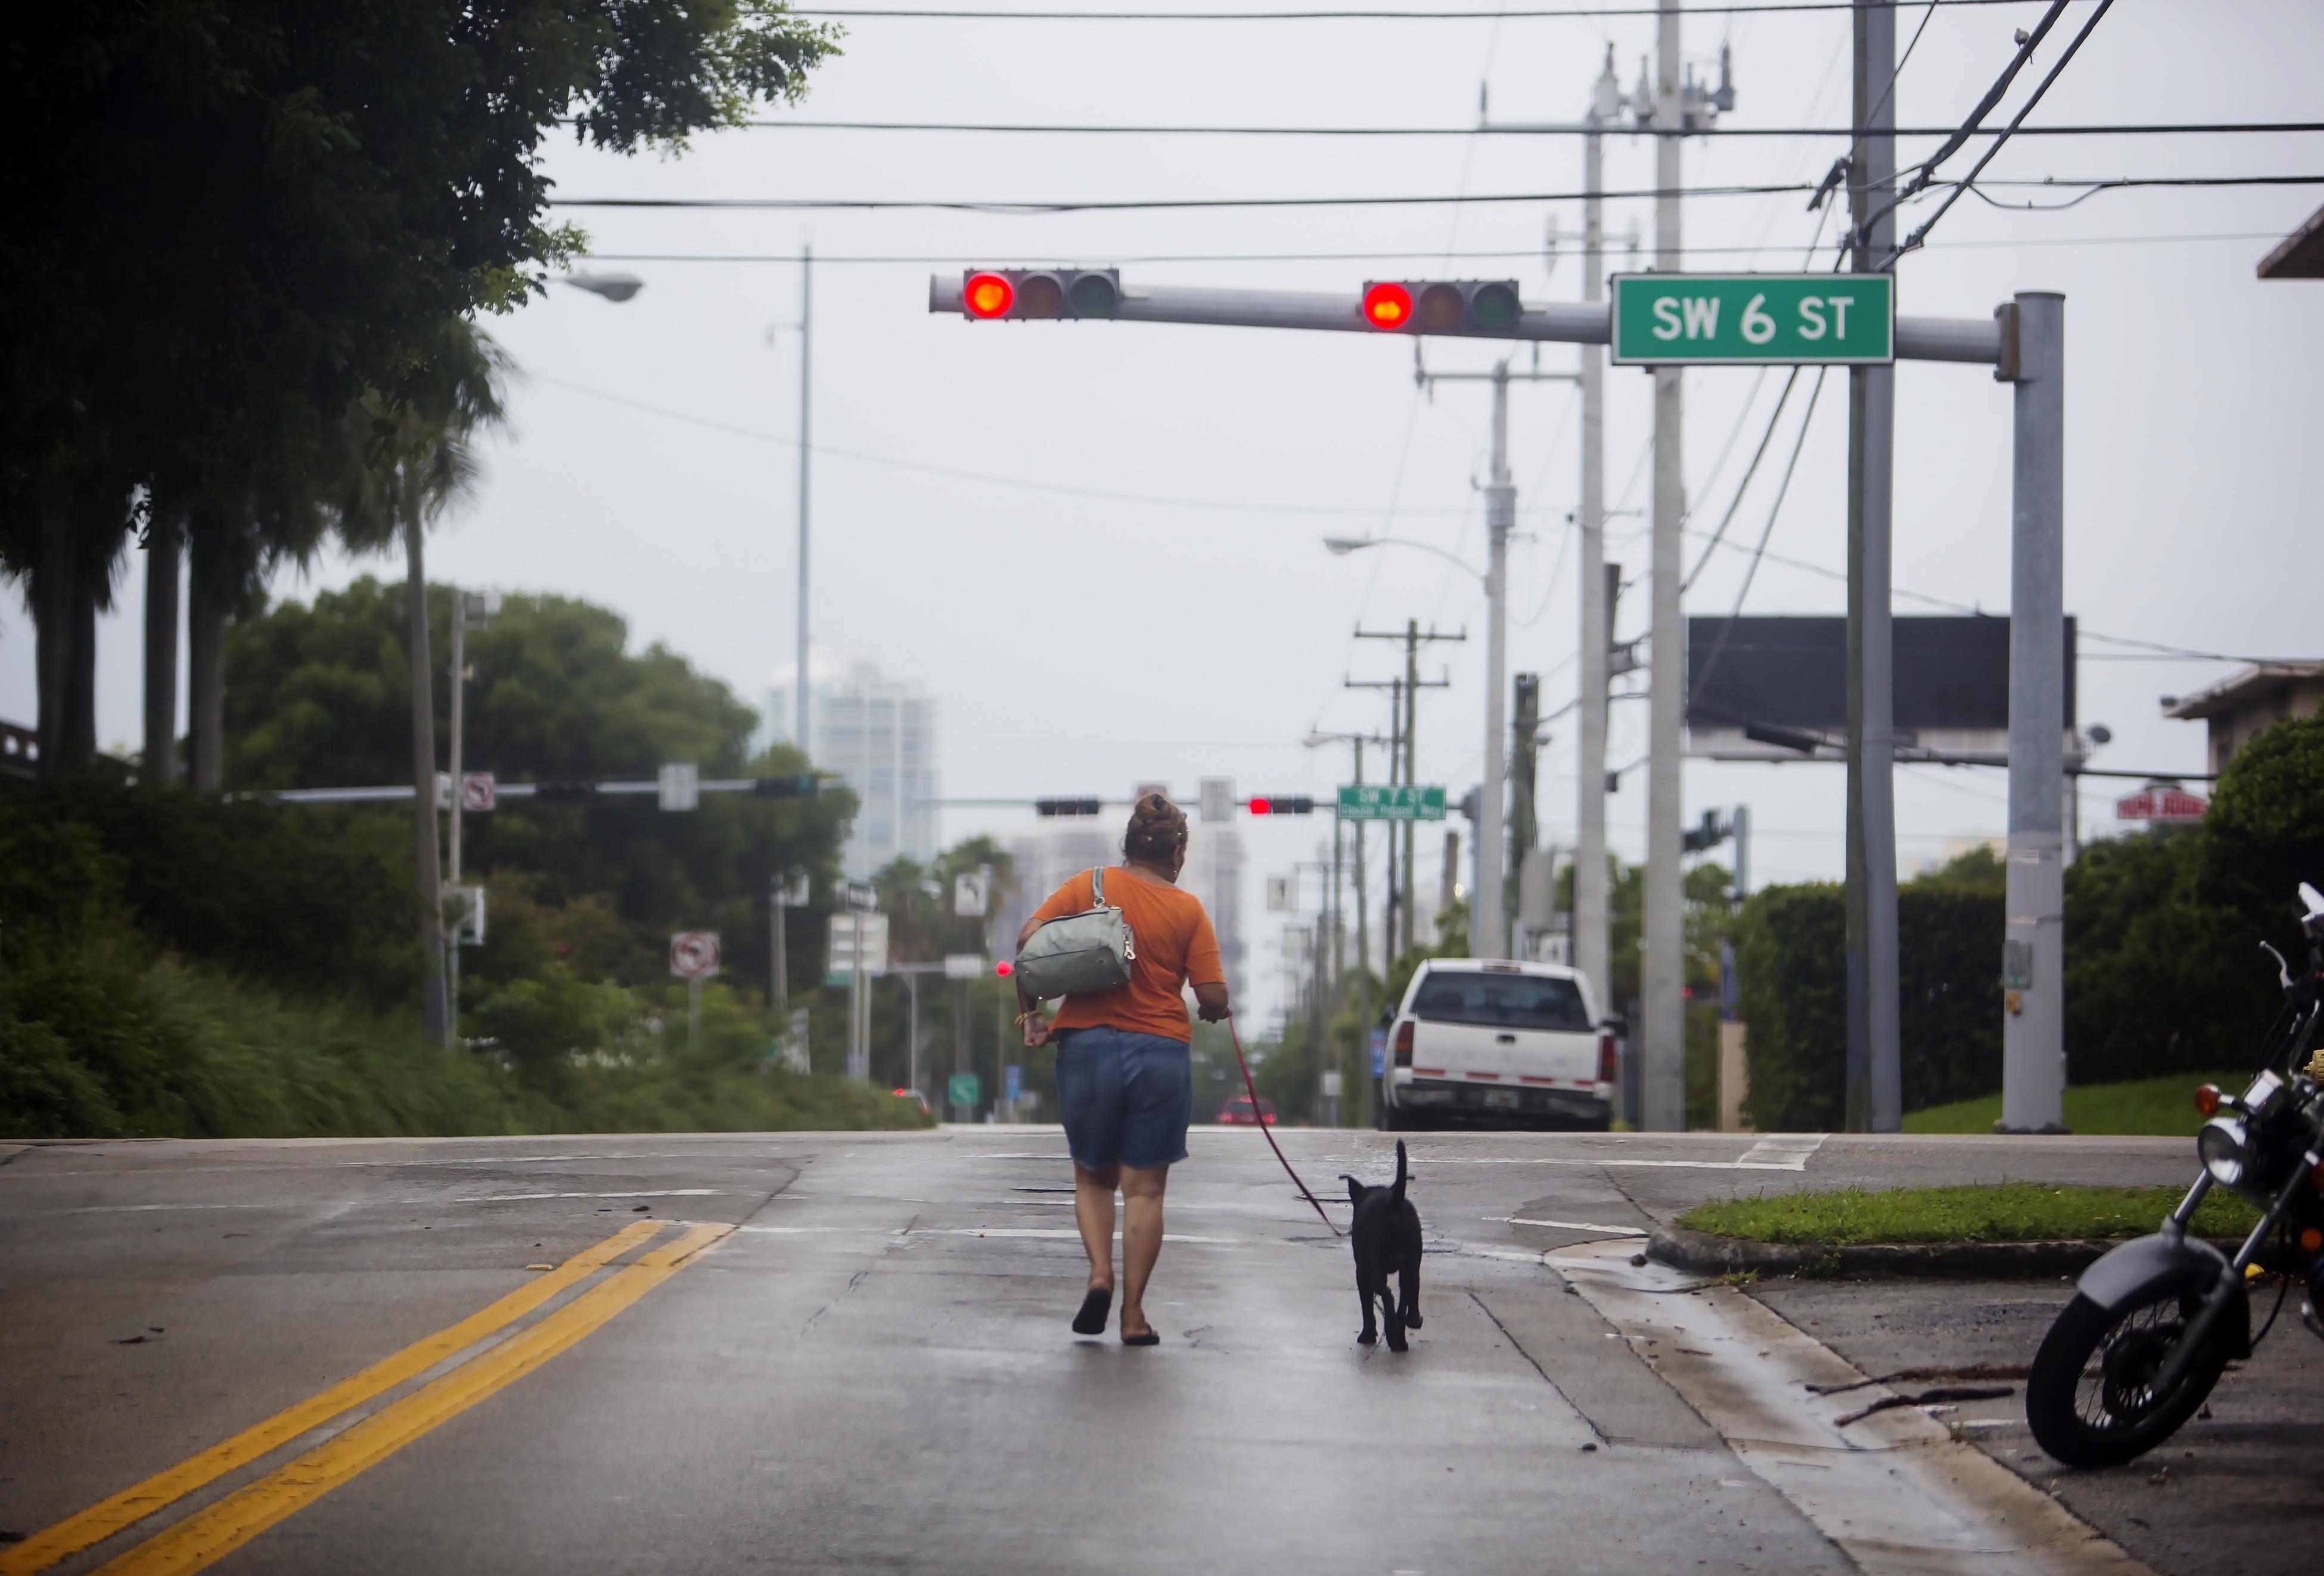 STORM IRMA 22 A woman walks her dog in Miami ahead of Hurricane Irma.